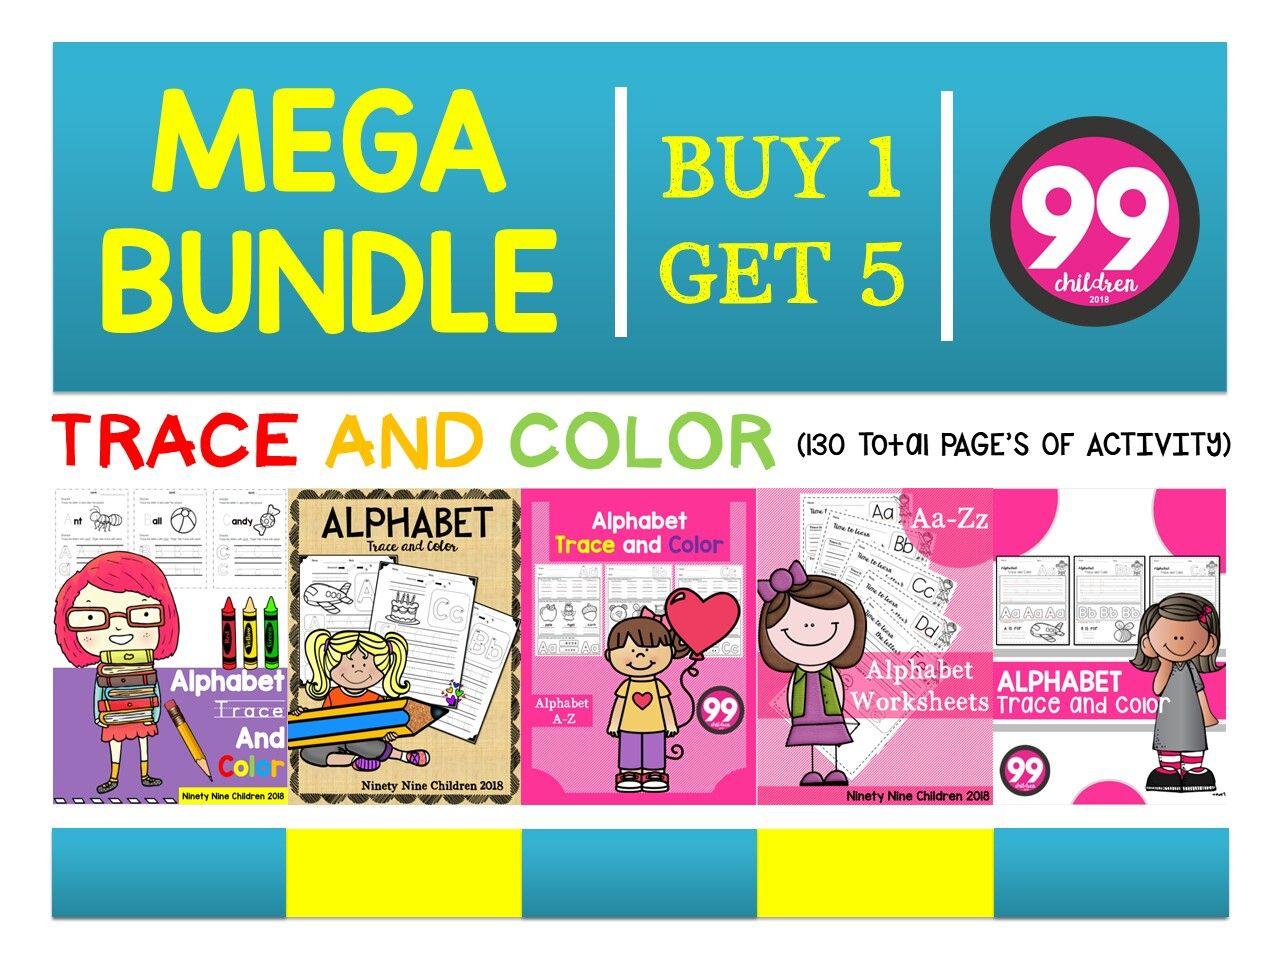 Mega Bundle Trace And Color By Ninetynine Children